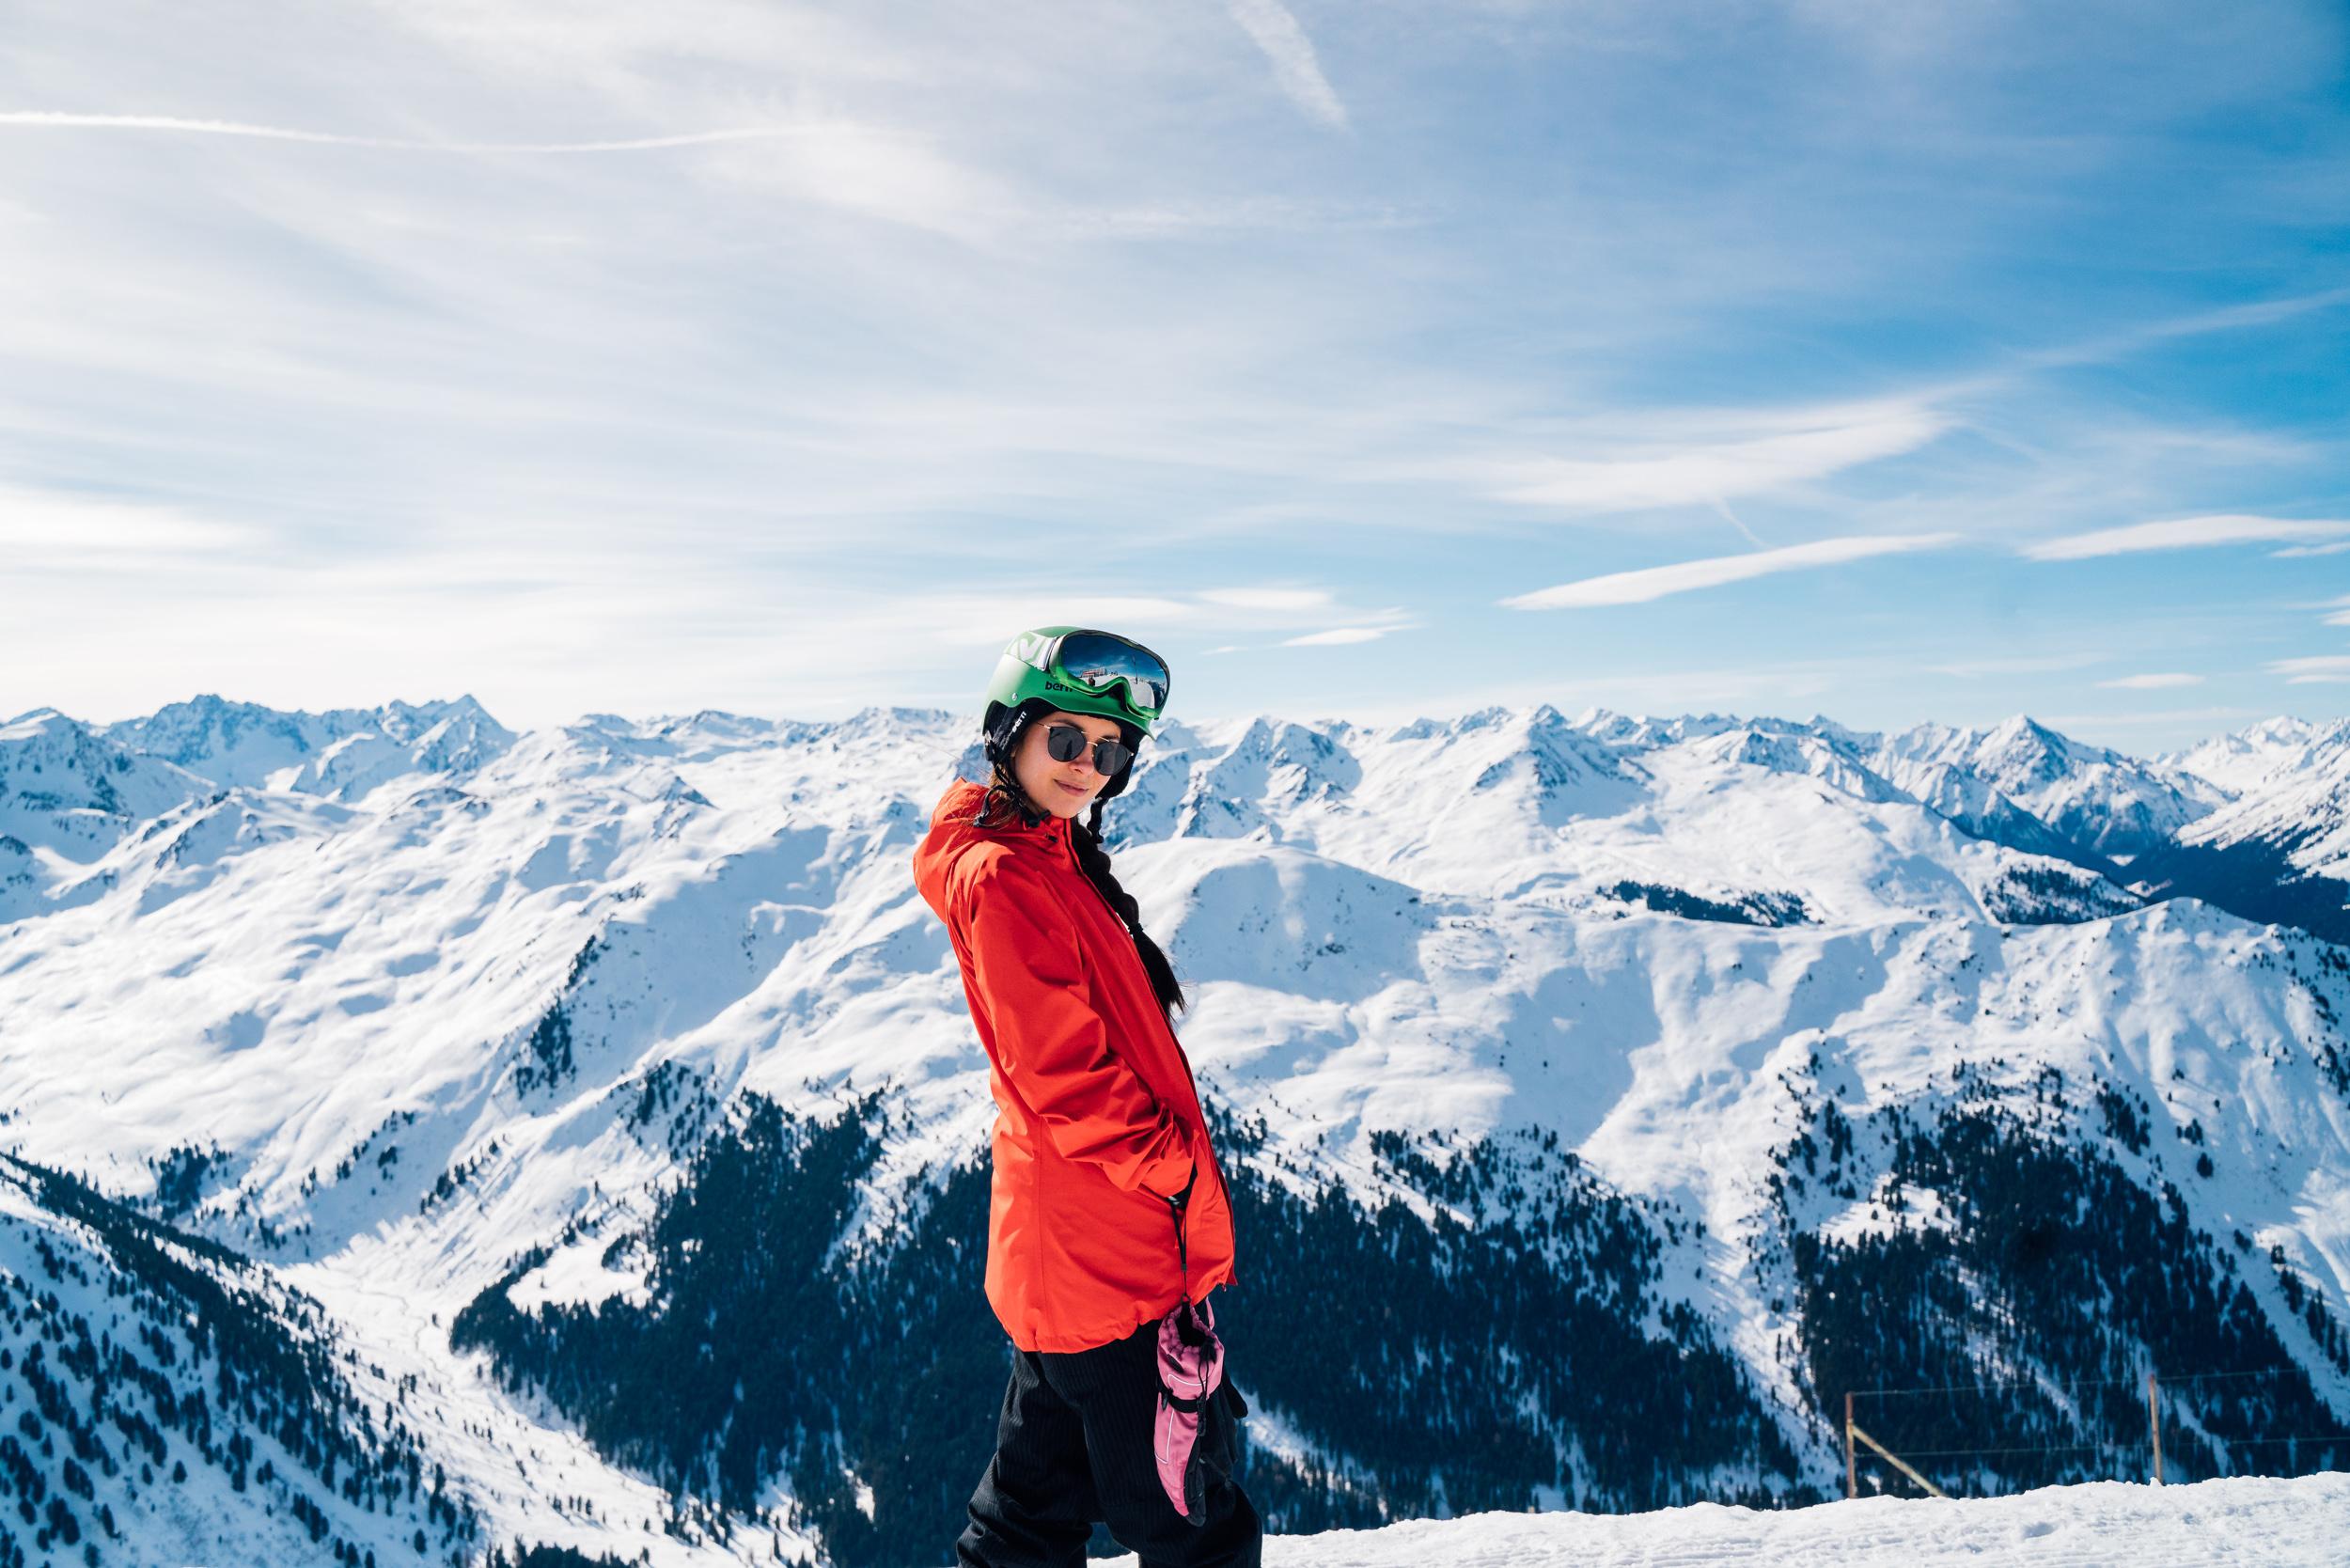 Alpeilla siis